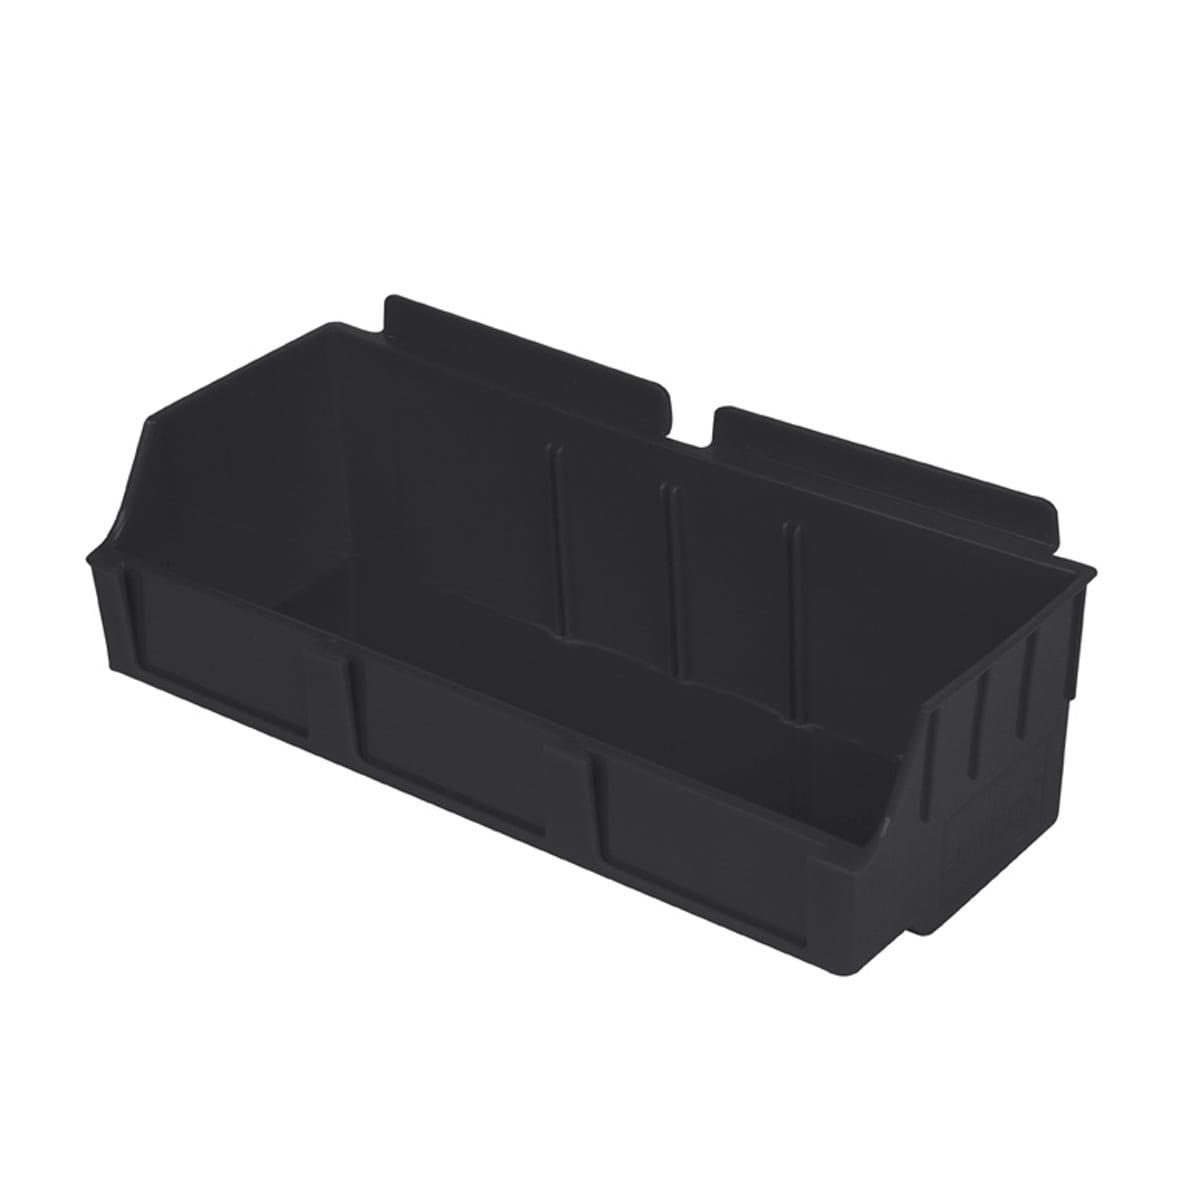 storbox wide black